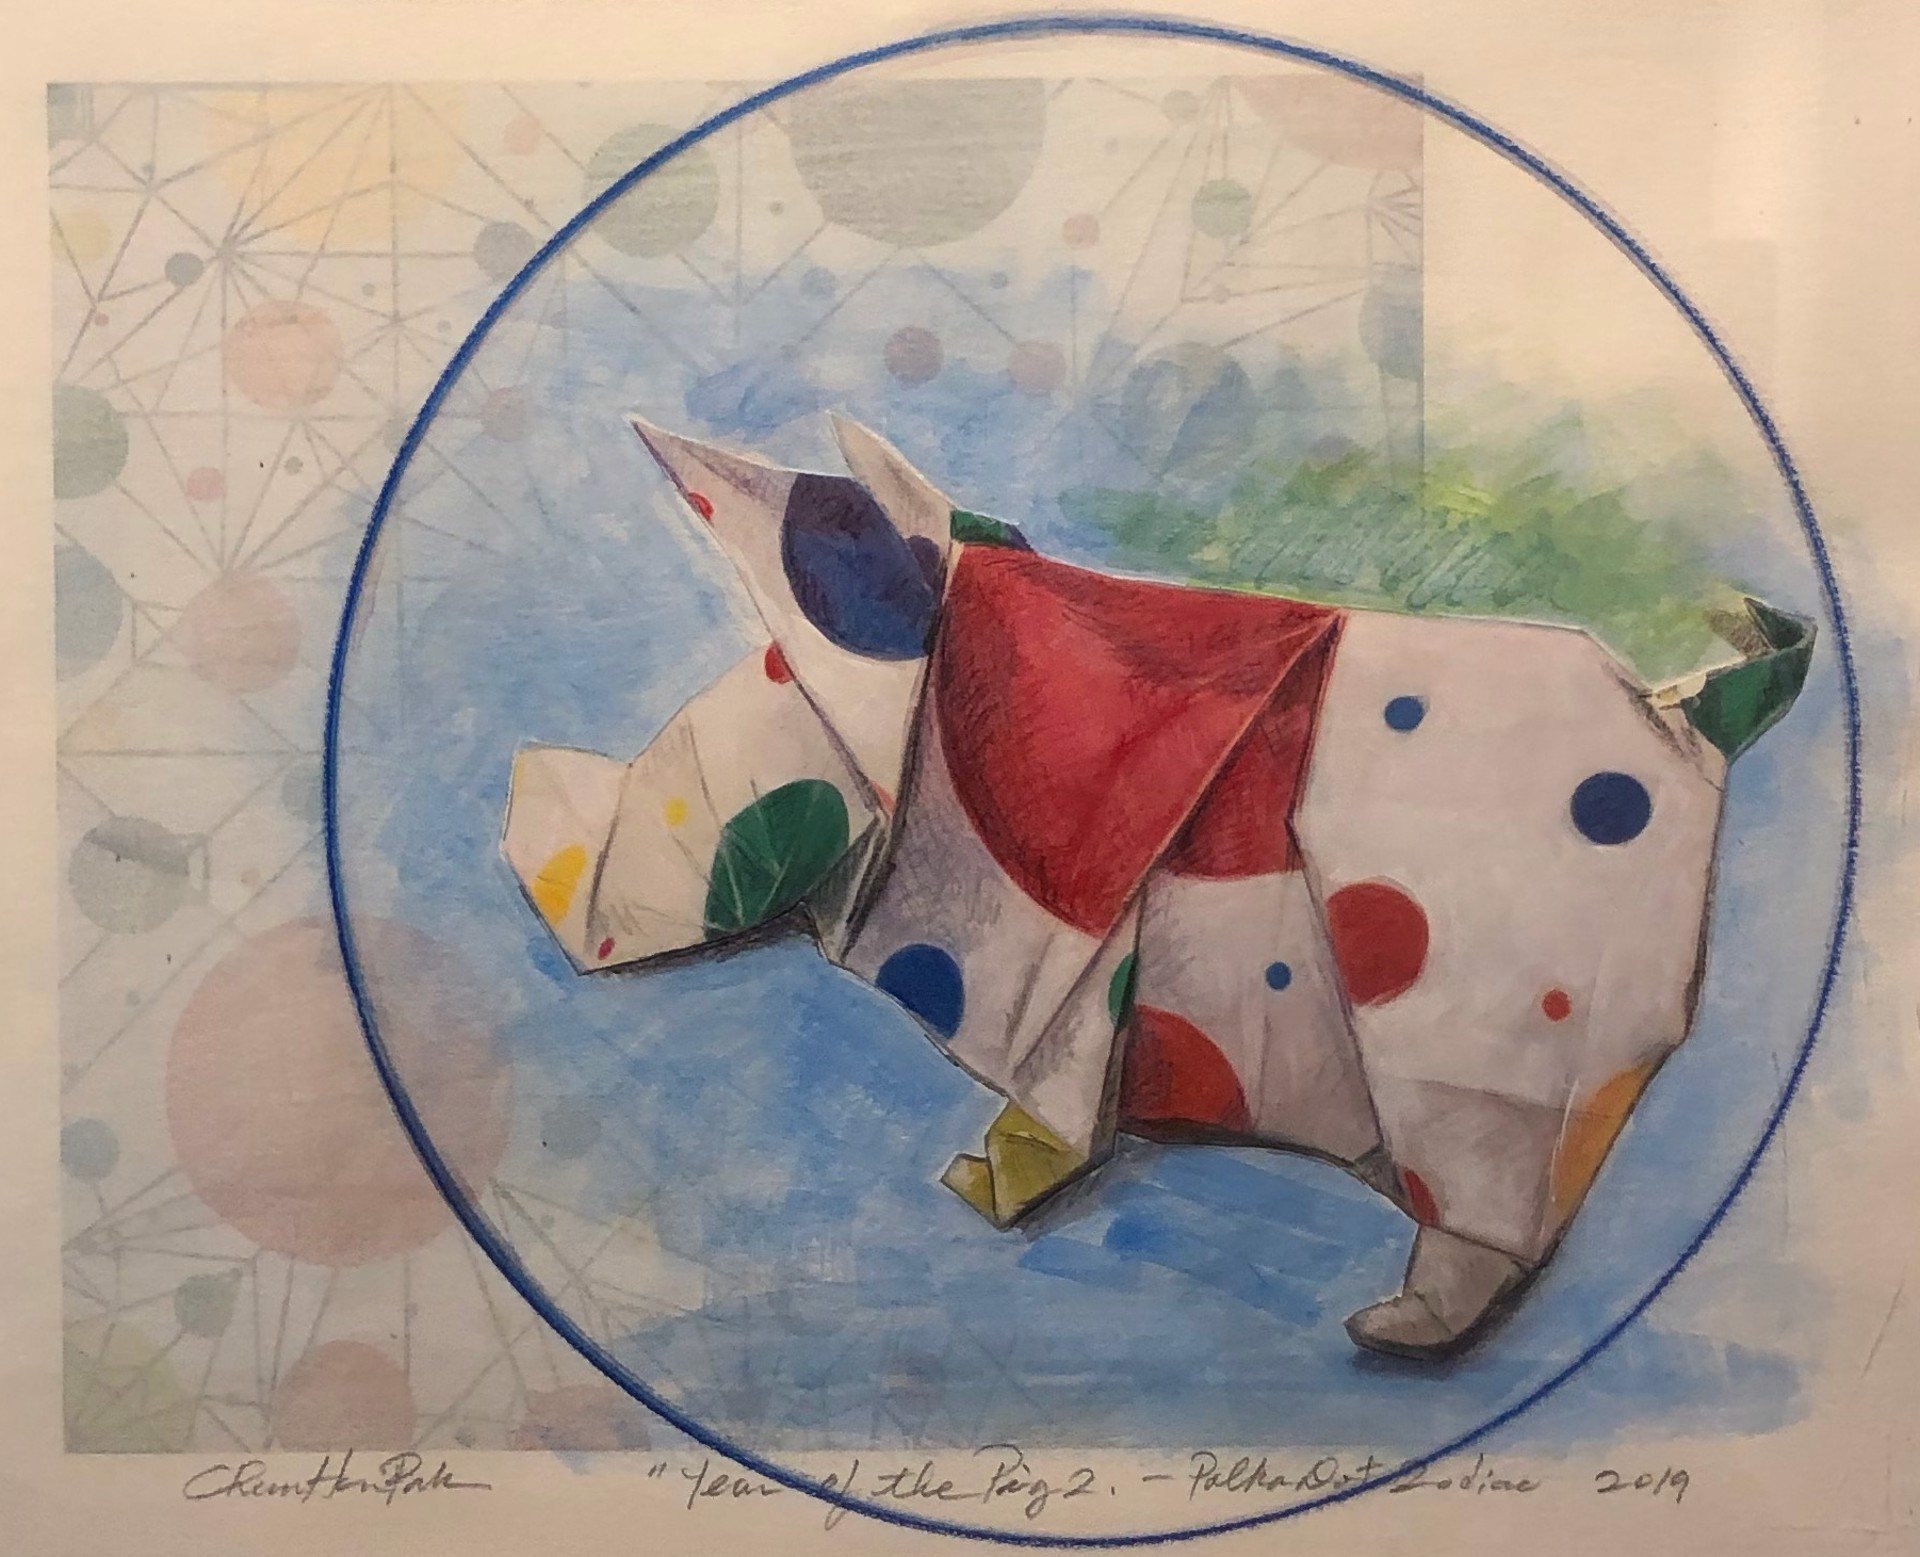 Year of the Pig II by Chun Hui Pak